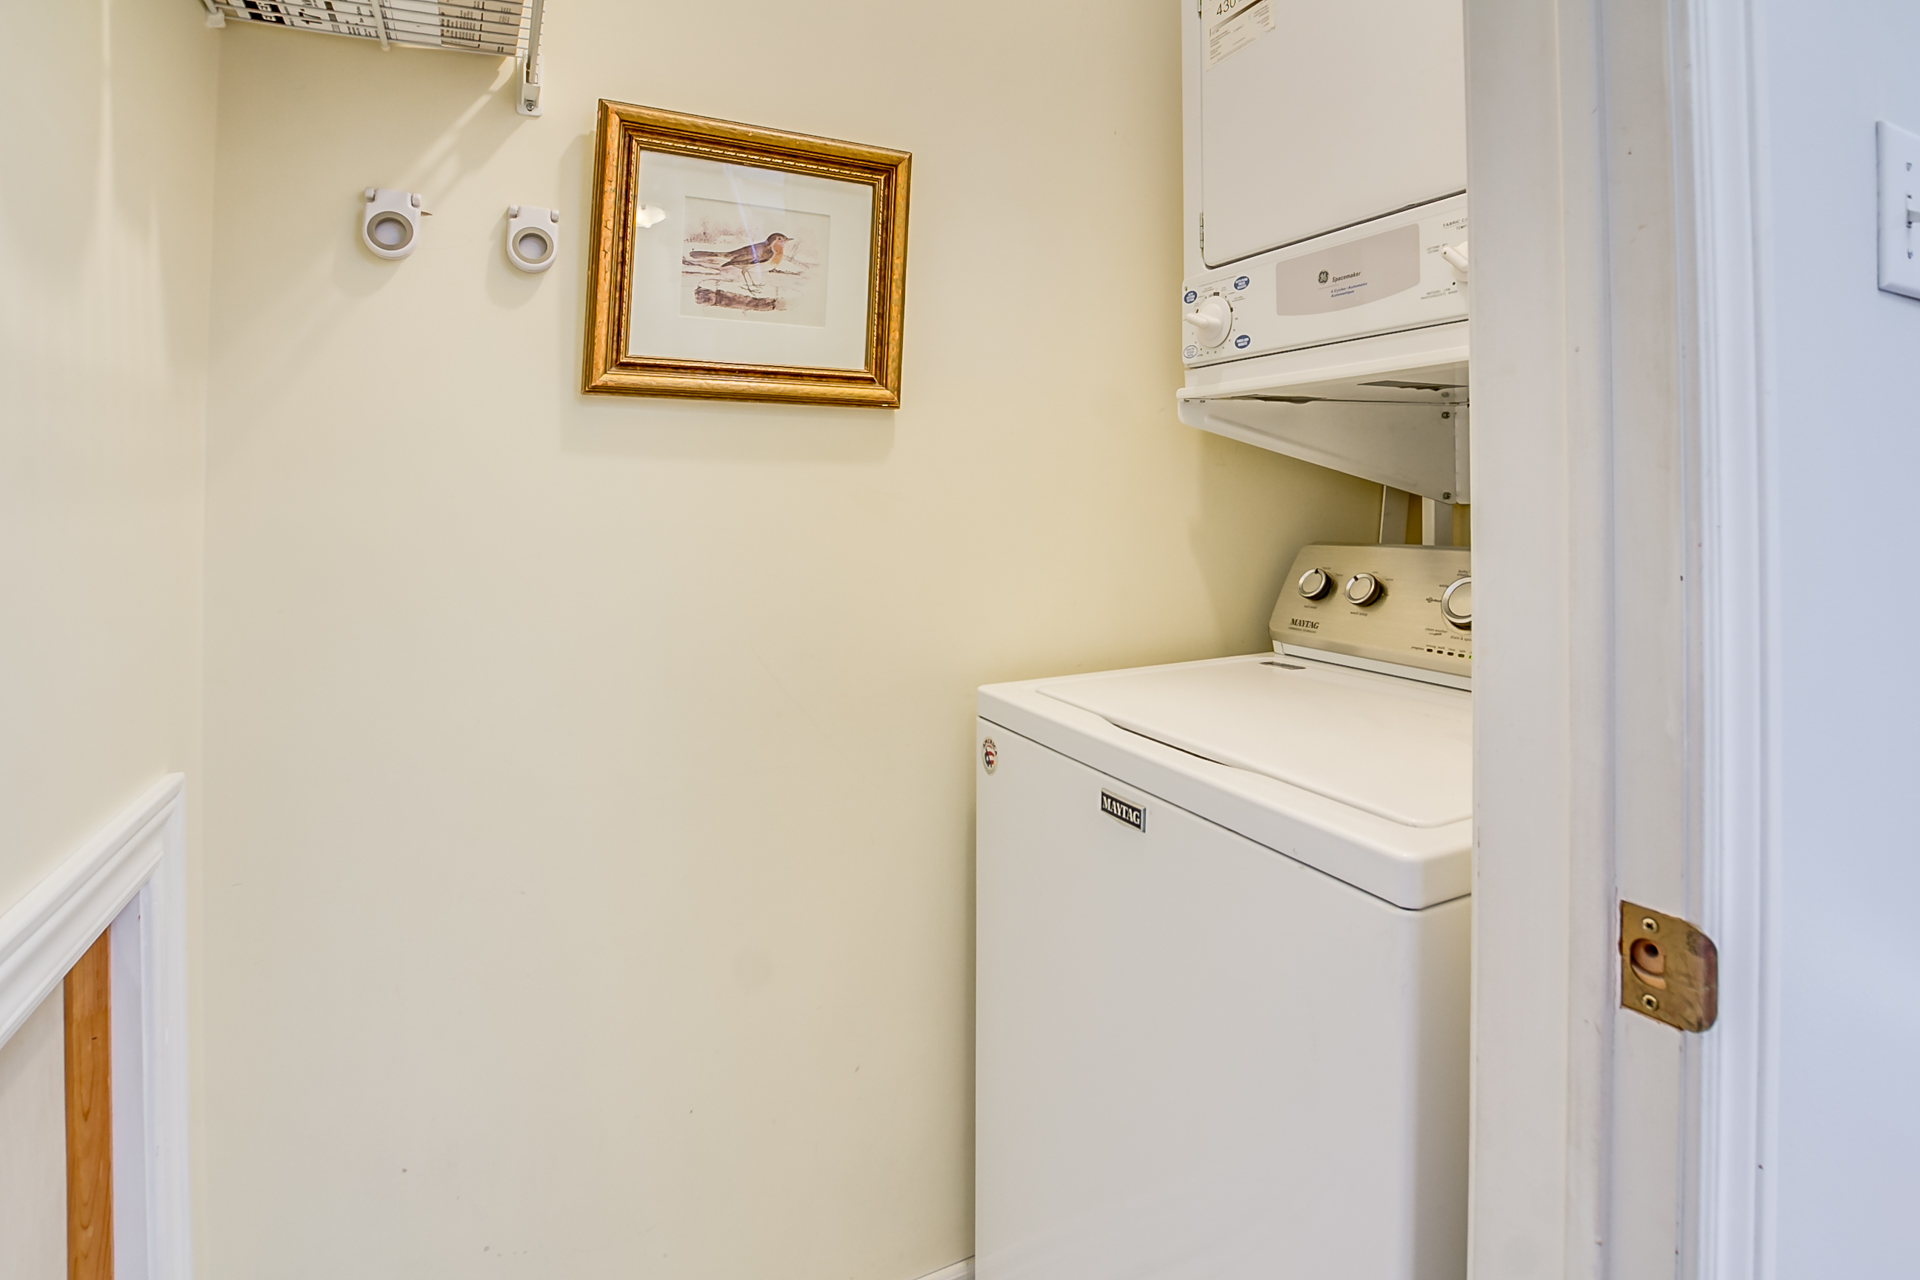 39_laundry_room1.jpg